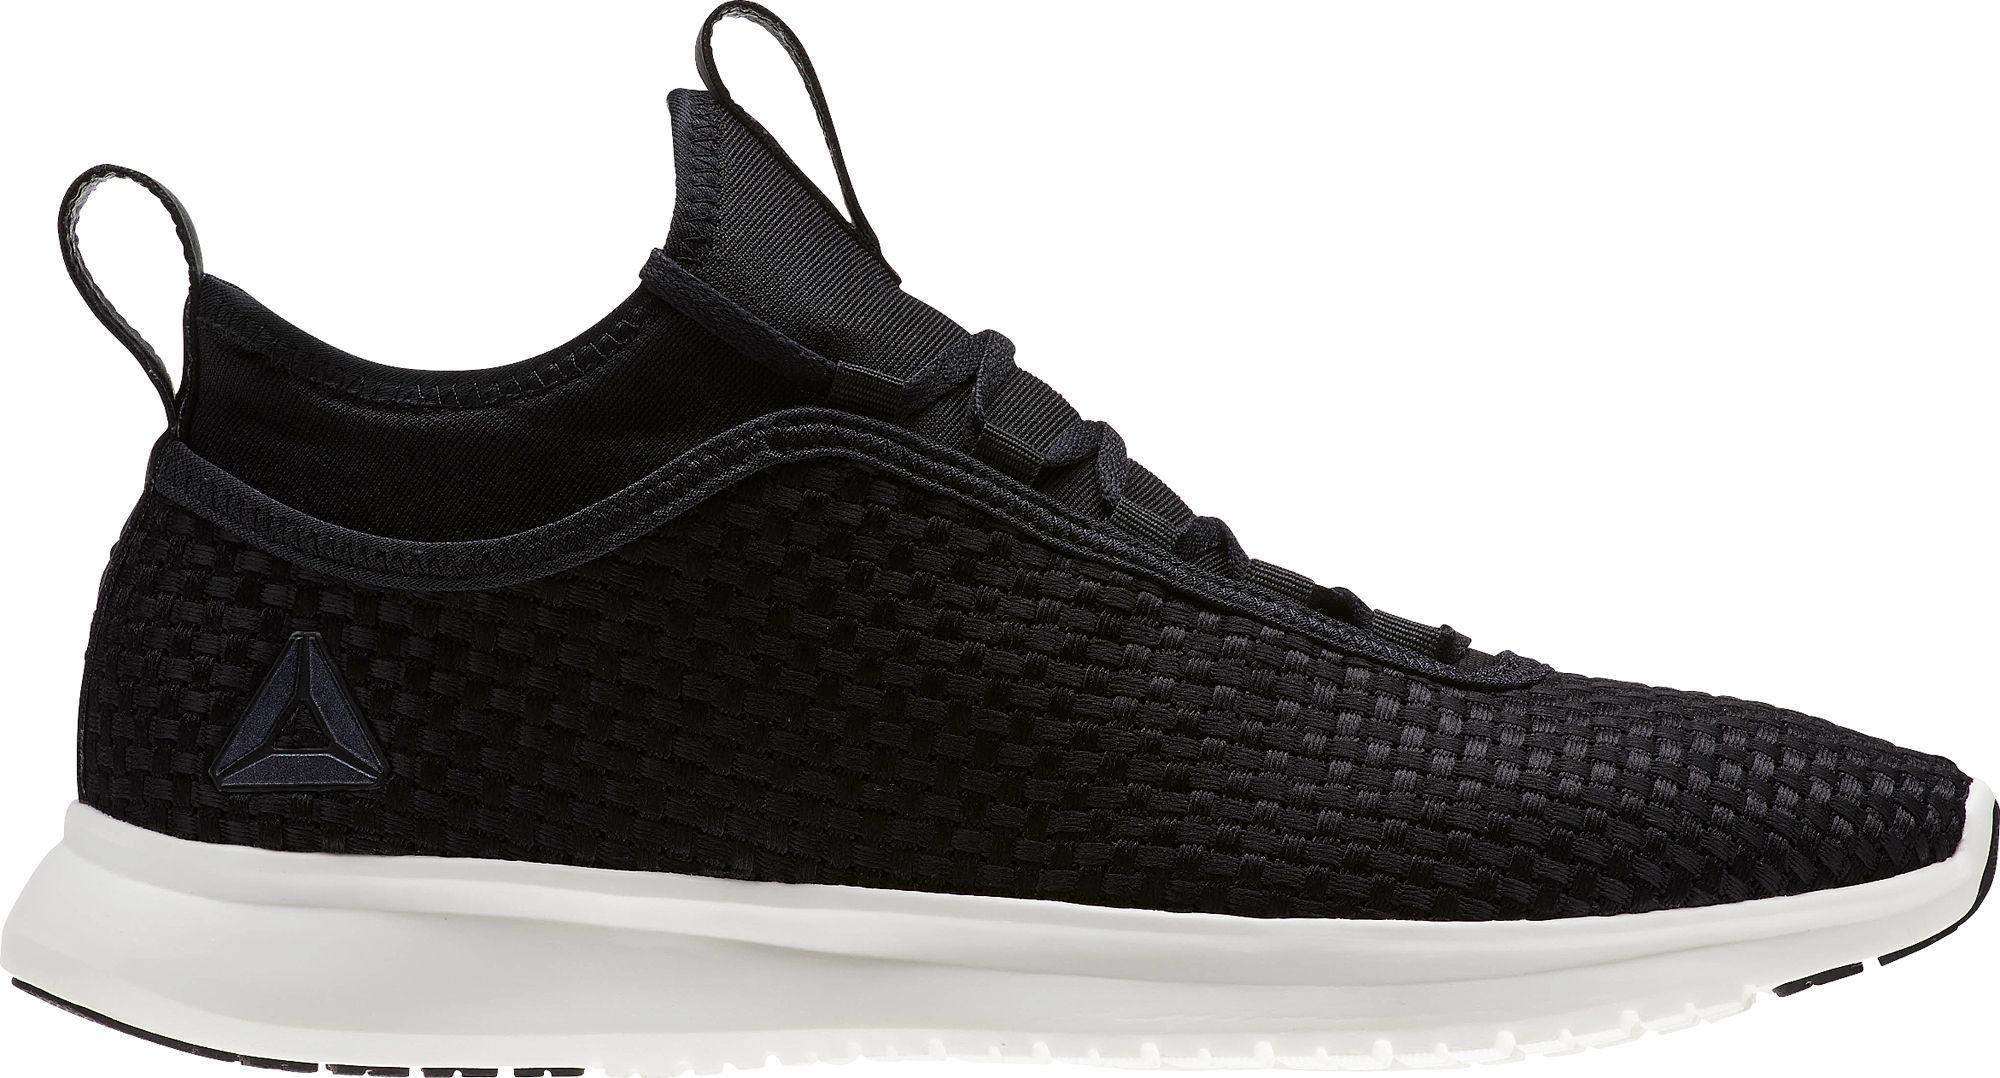 Lyst - Reebok Plus Runner Woven Running Shoes in Black for Men 232a8d85f